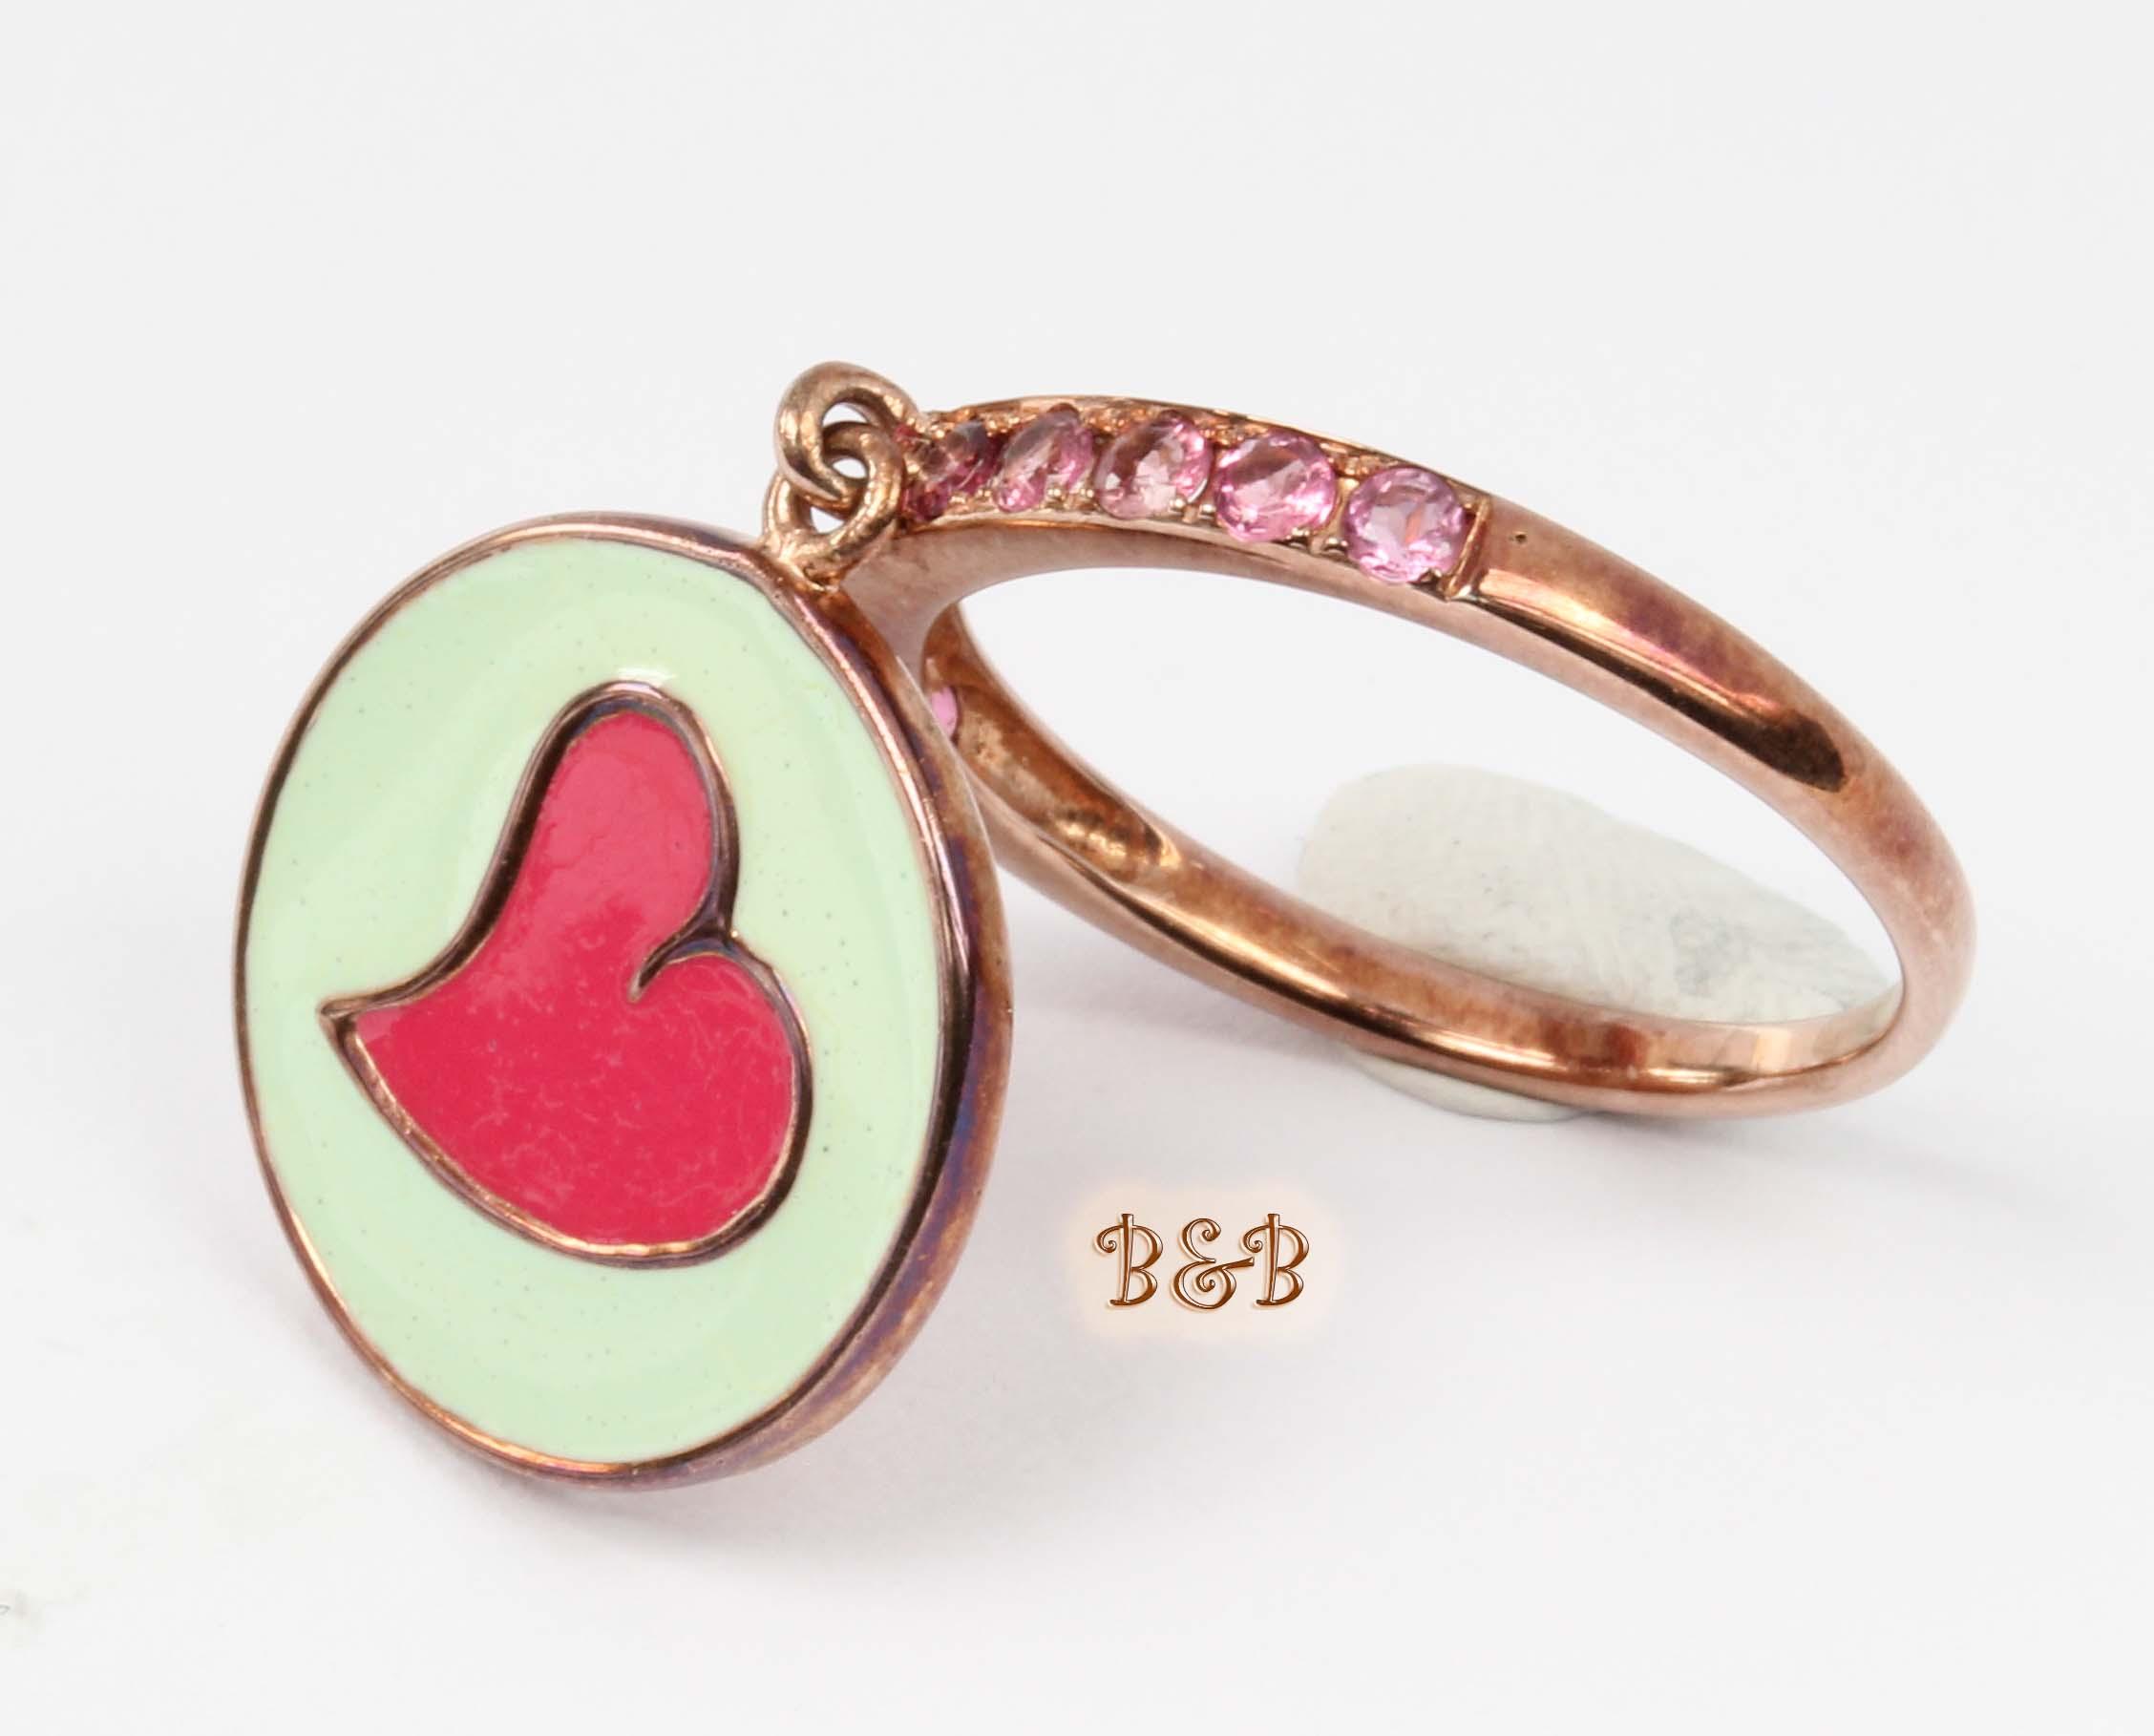 Silver ring_B&B_1724